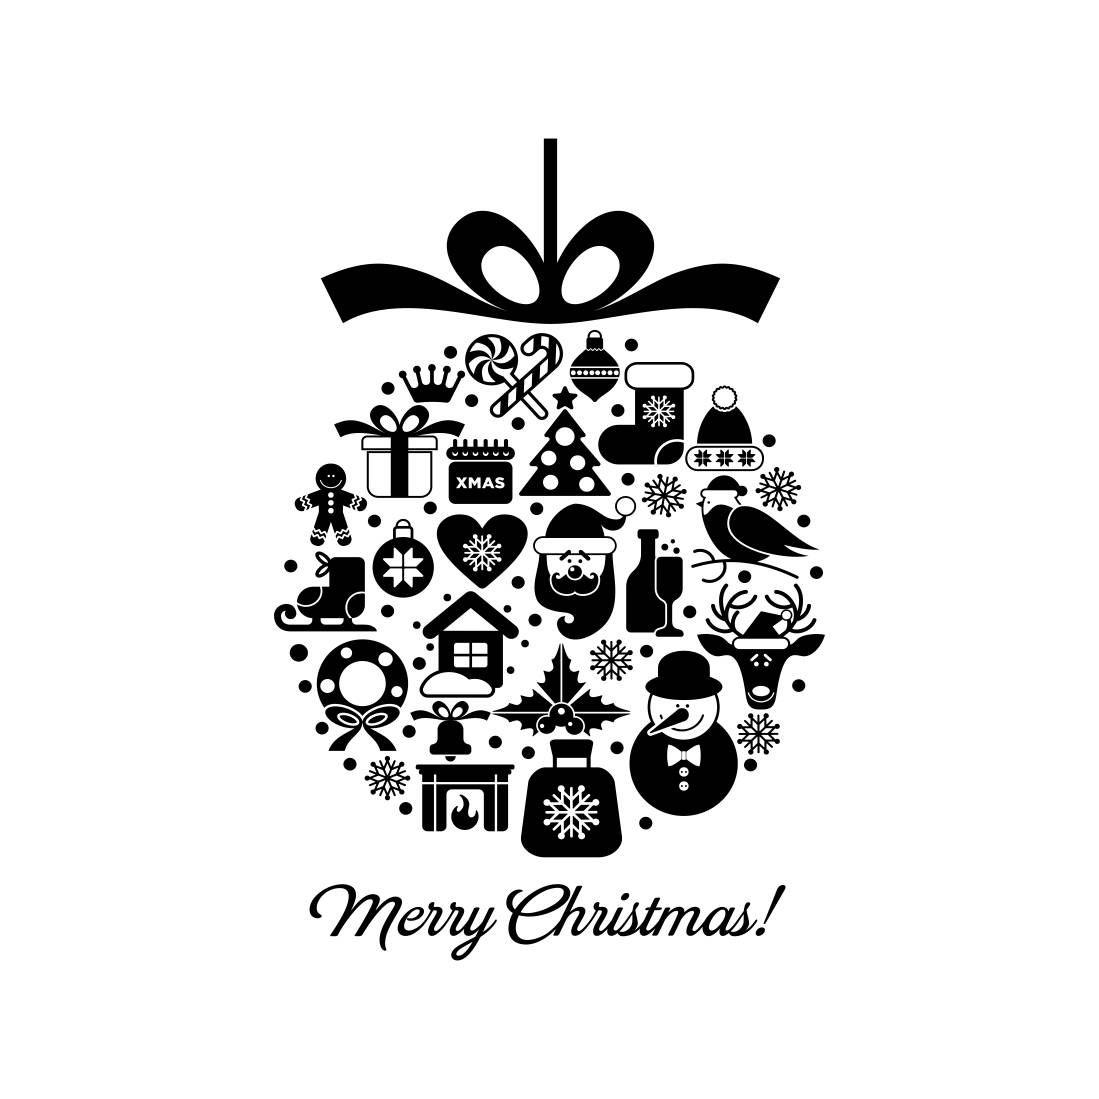 Merry Chrismas Ball Elements Graphics Svg Eps Cdr Ai